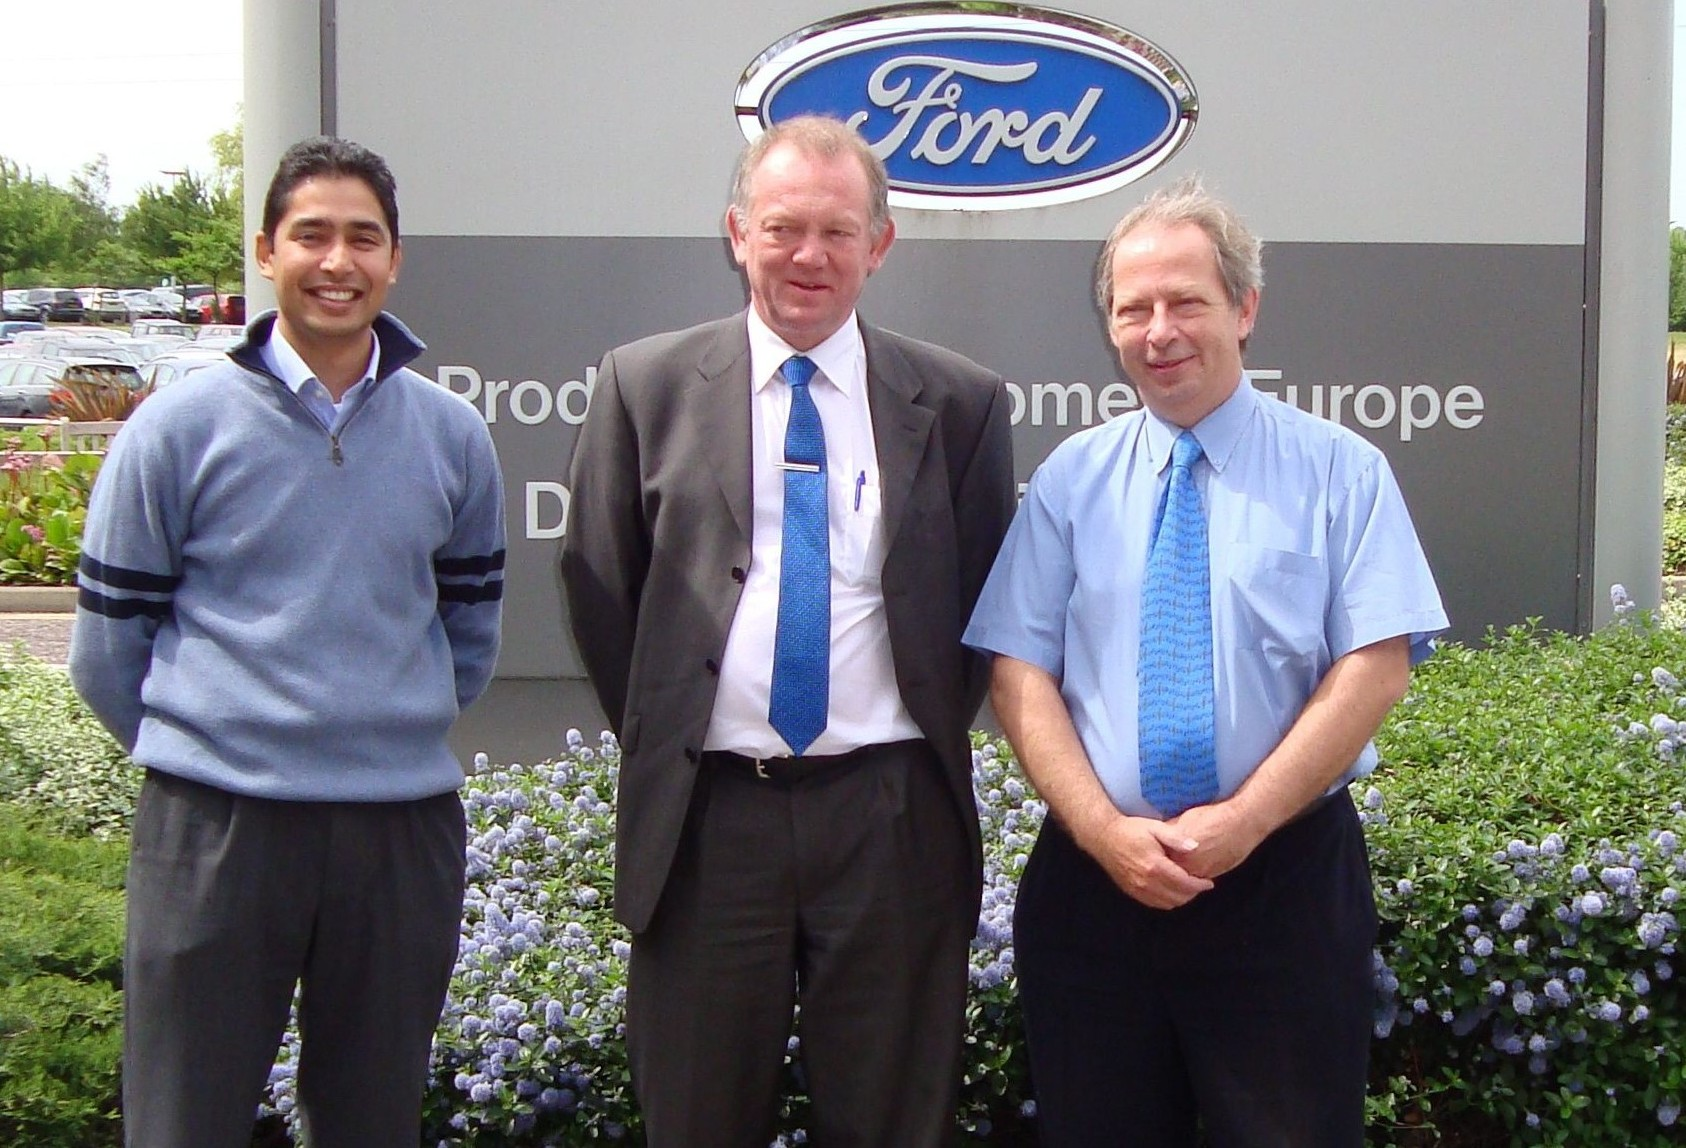 Ford Dunton uses Kvaser hardware in engine development